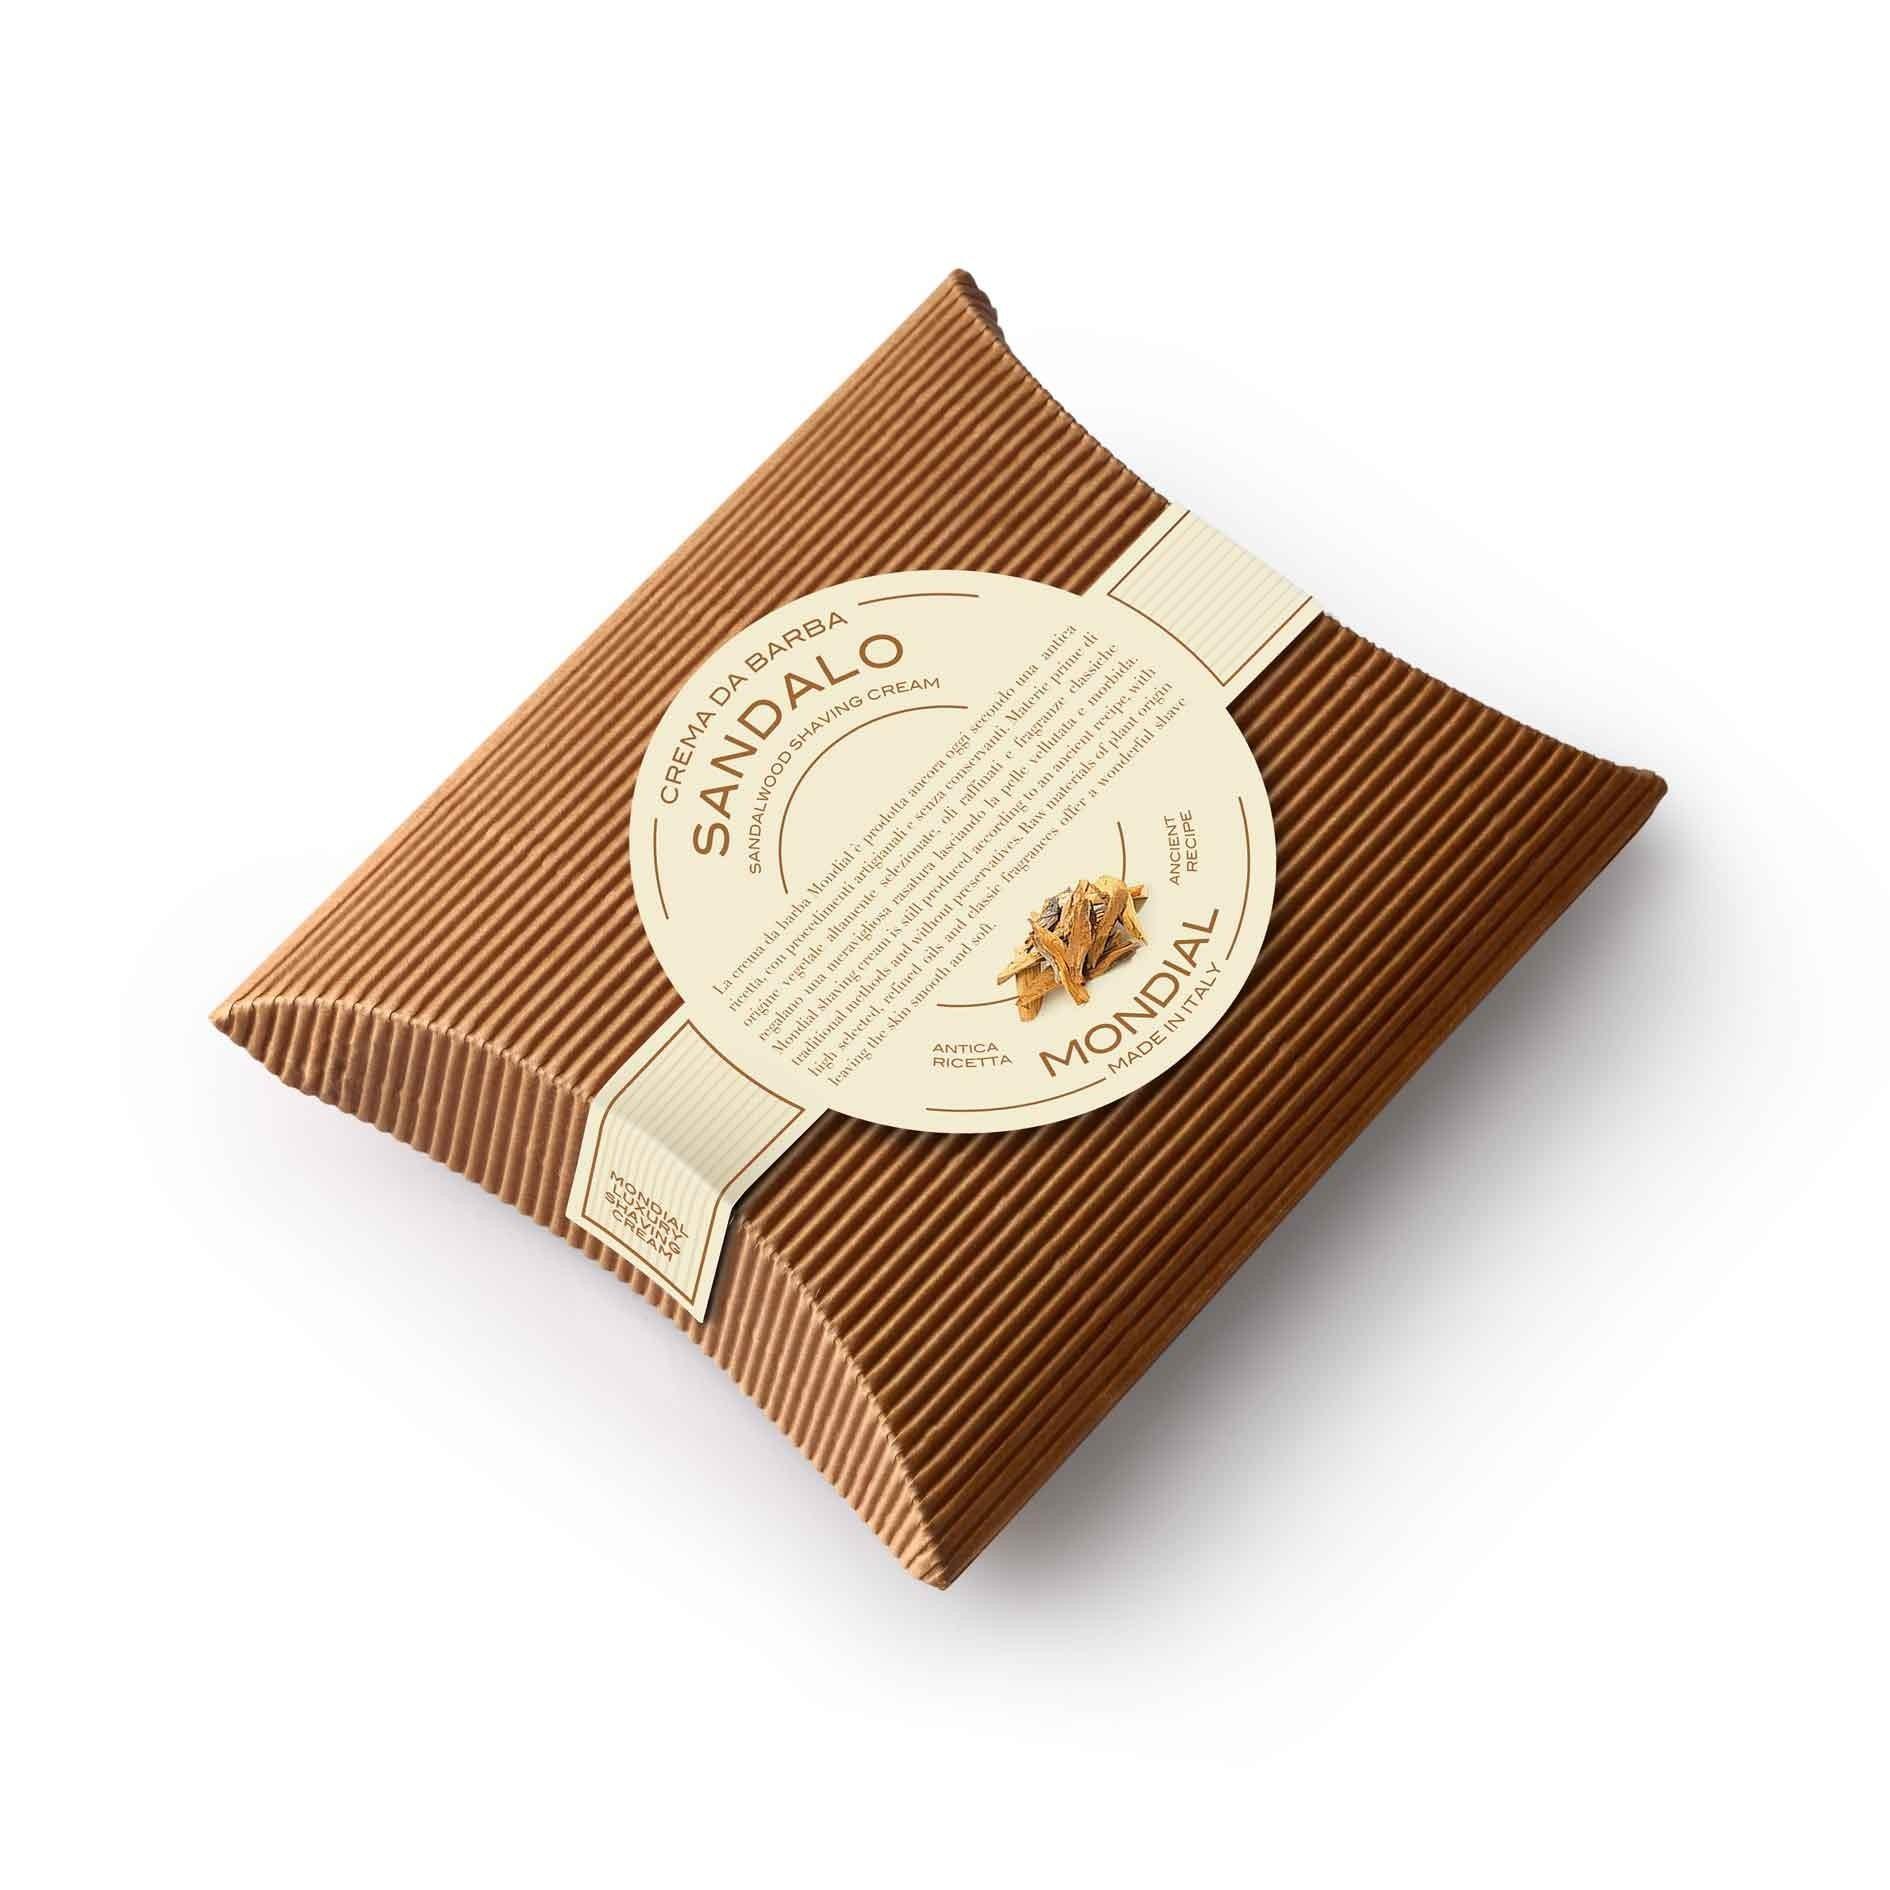 Mondial Classic Luxury Shaving Cream Sandalo Refill